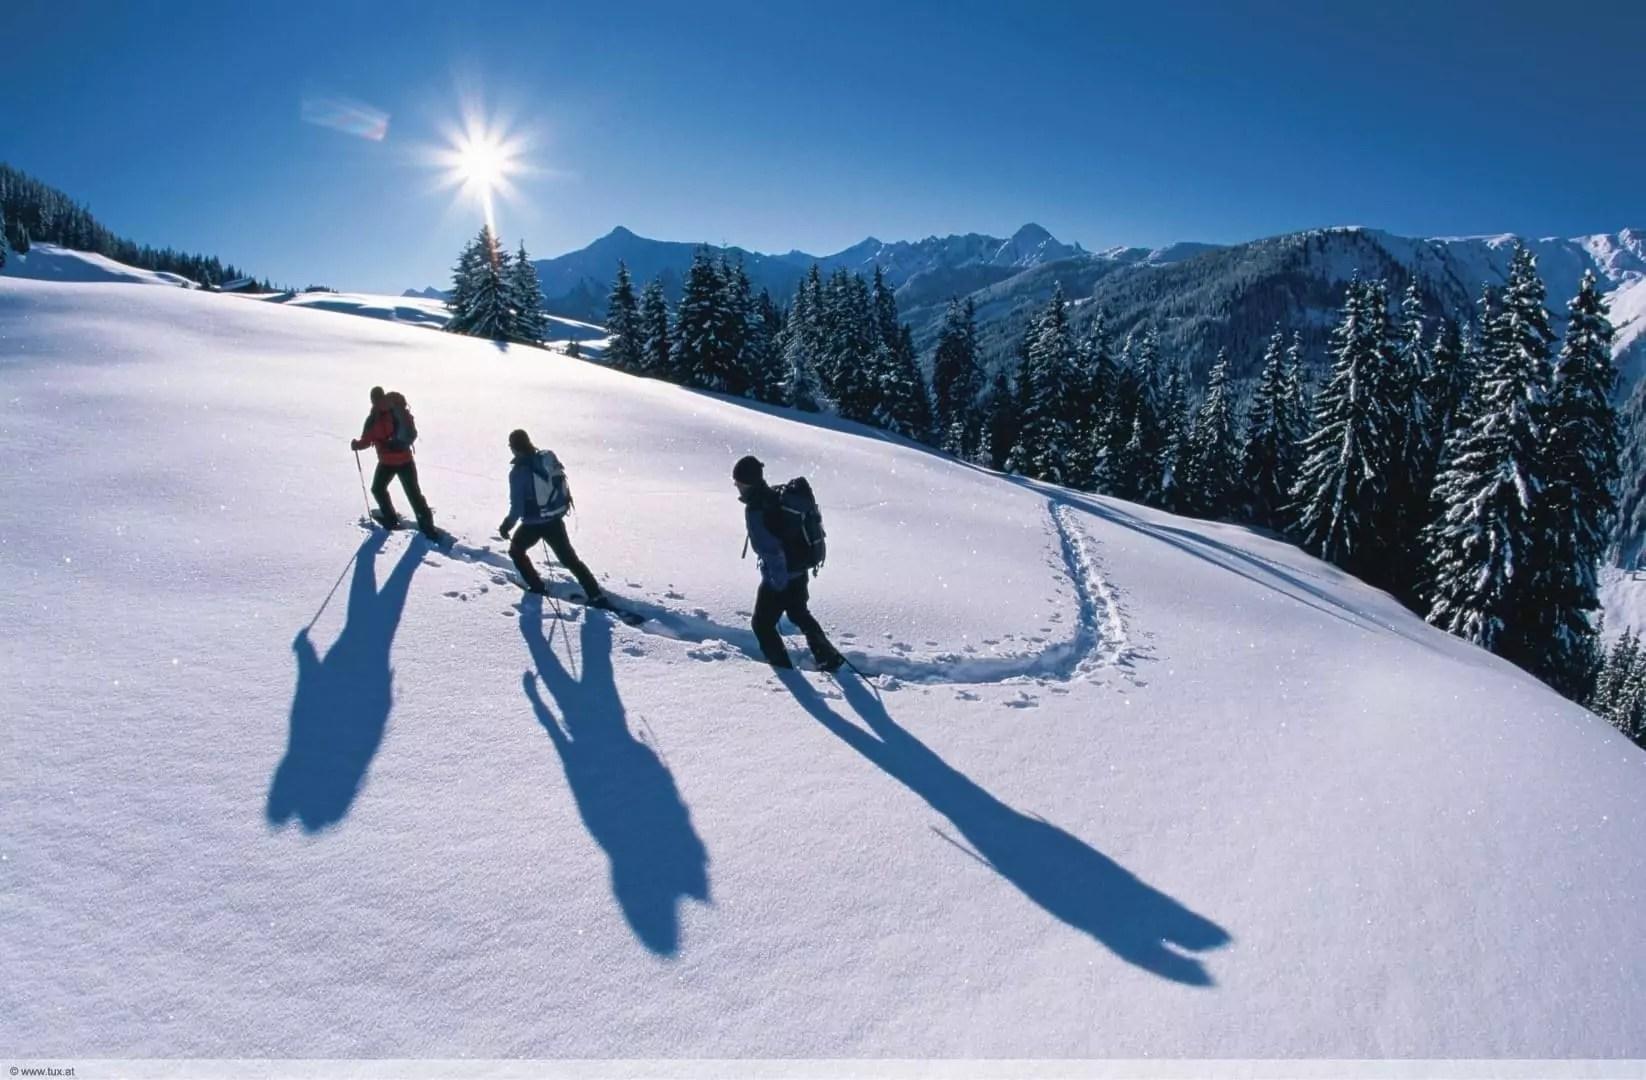 après-ski in Tux